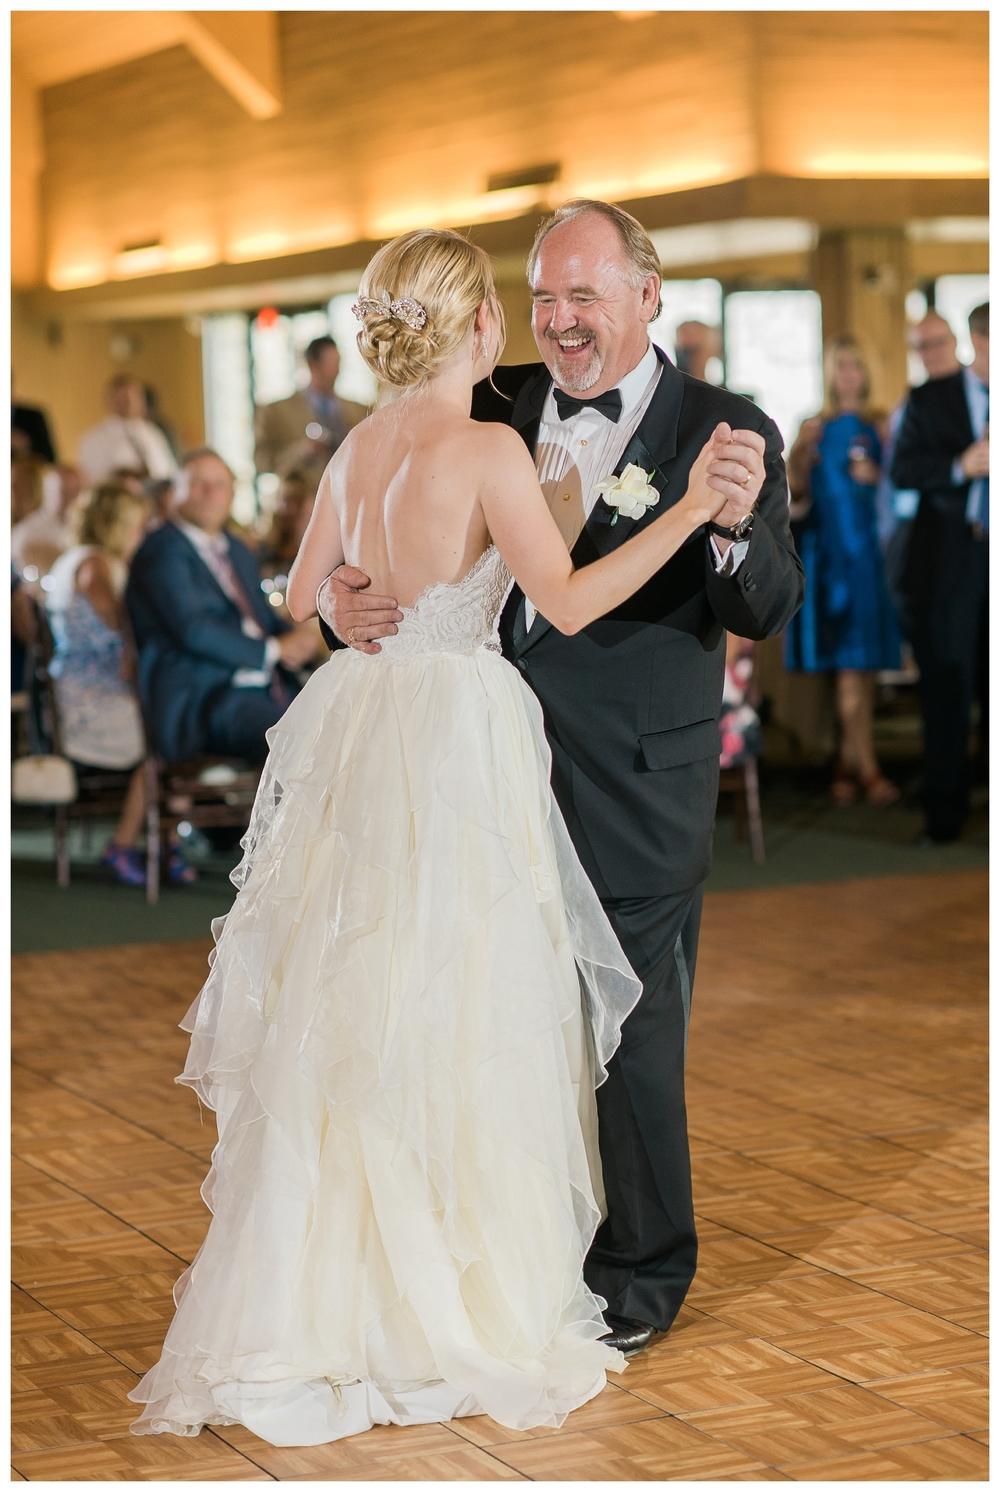 Rebecca_Bridges_Photography_Indianapolis_Wedding_Photographer_4587.jpg